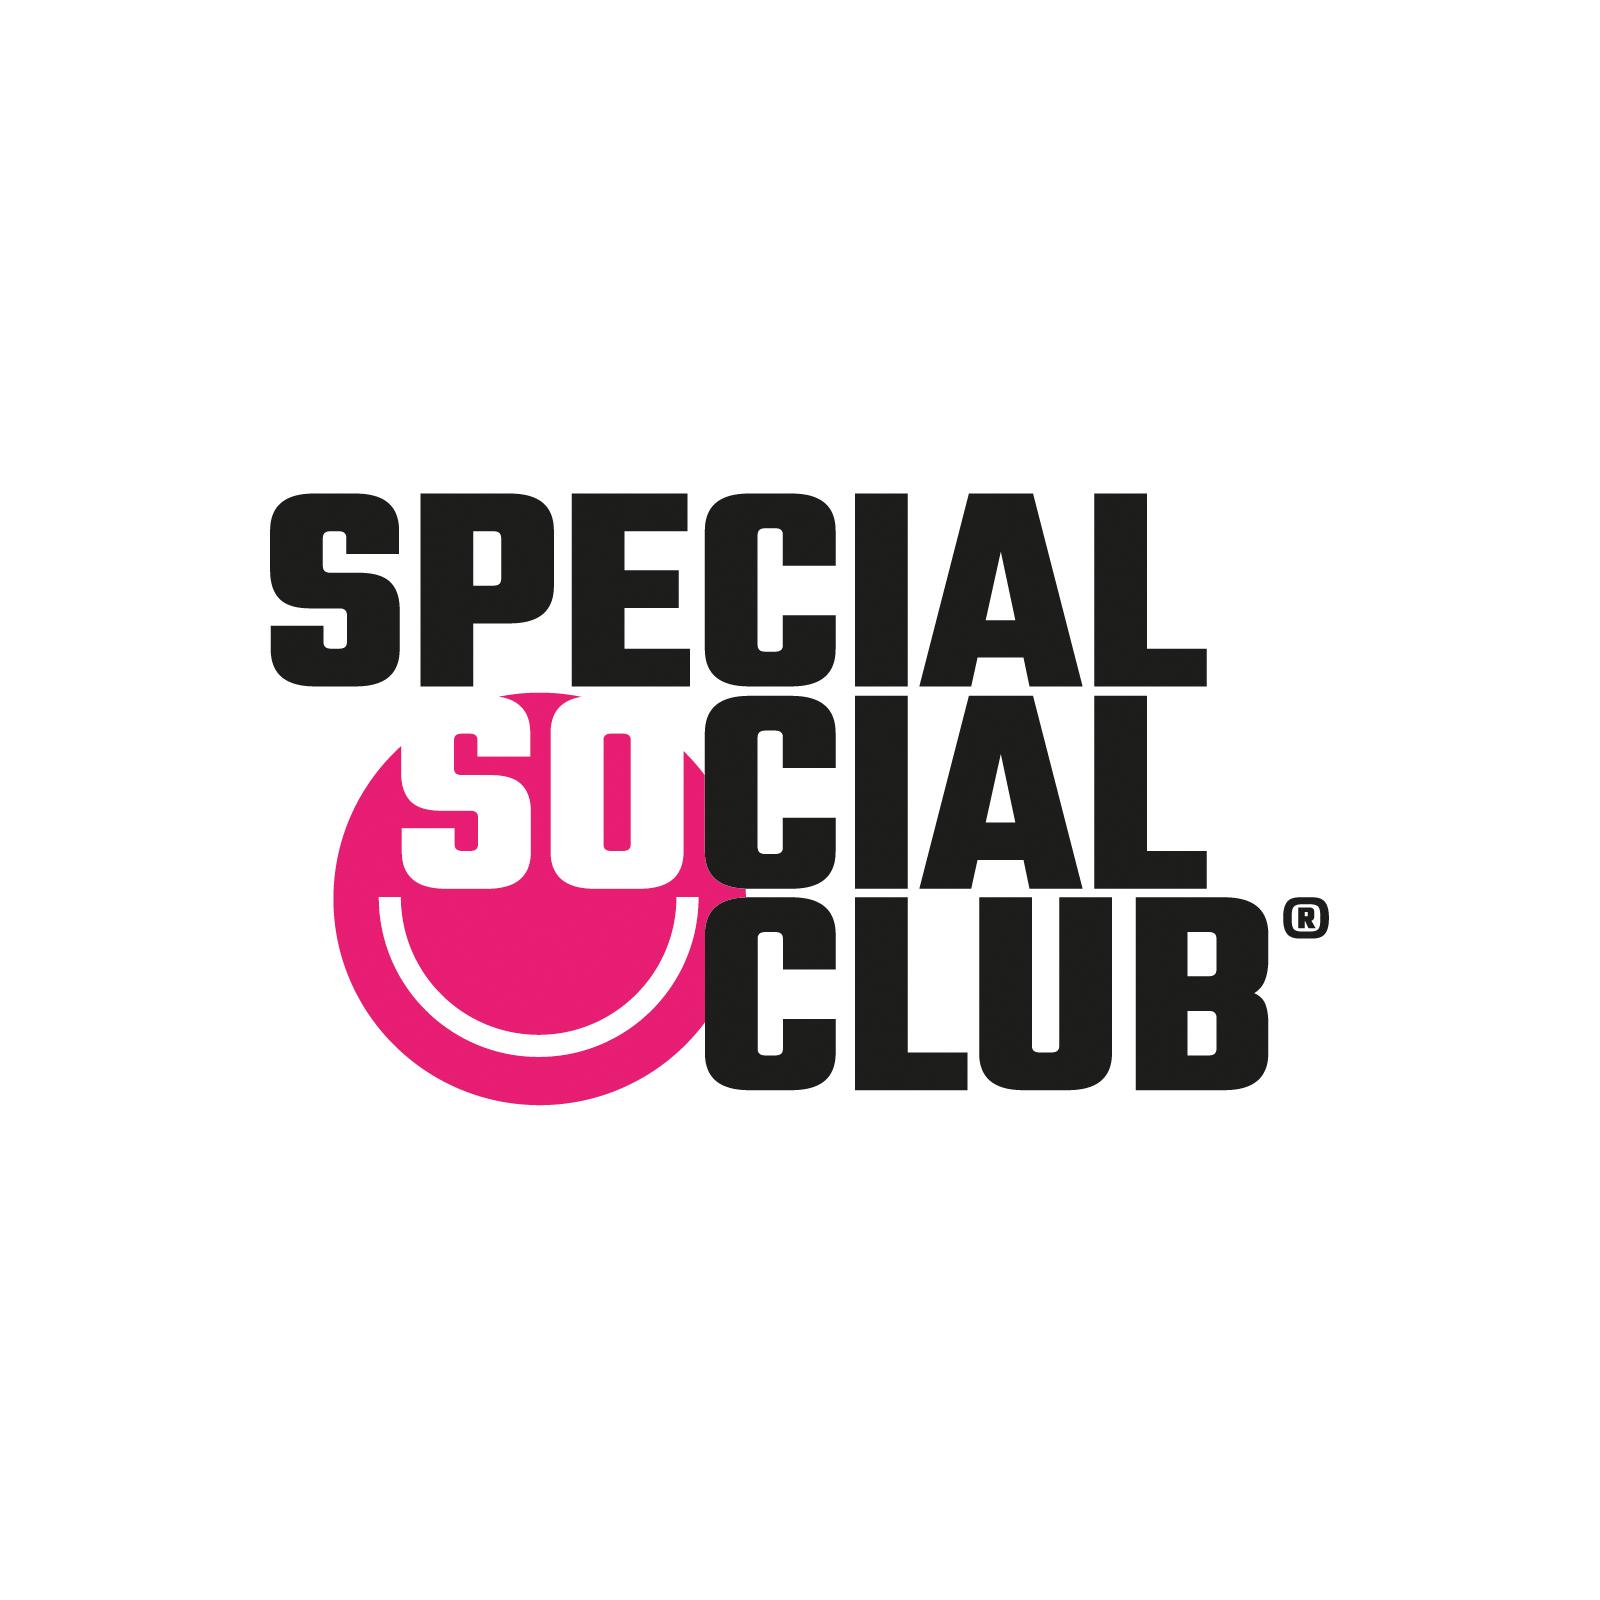 Special social club